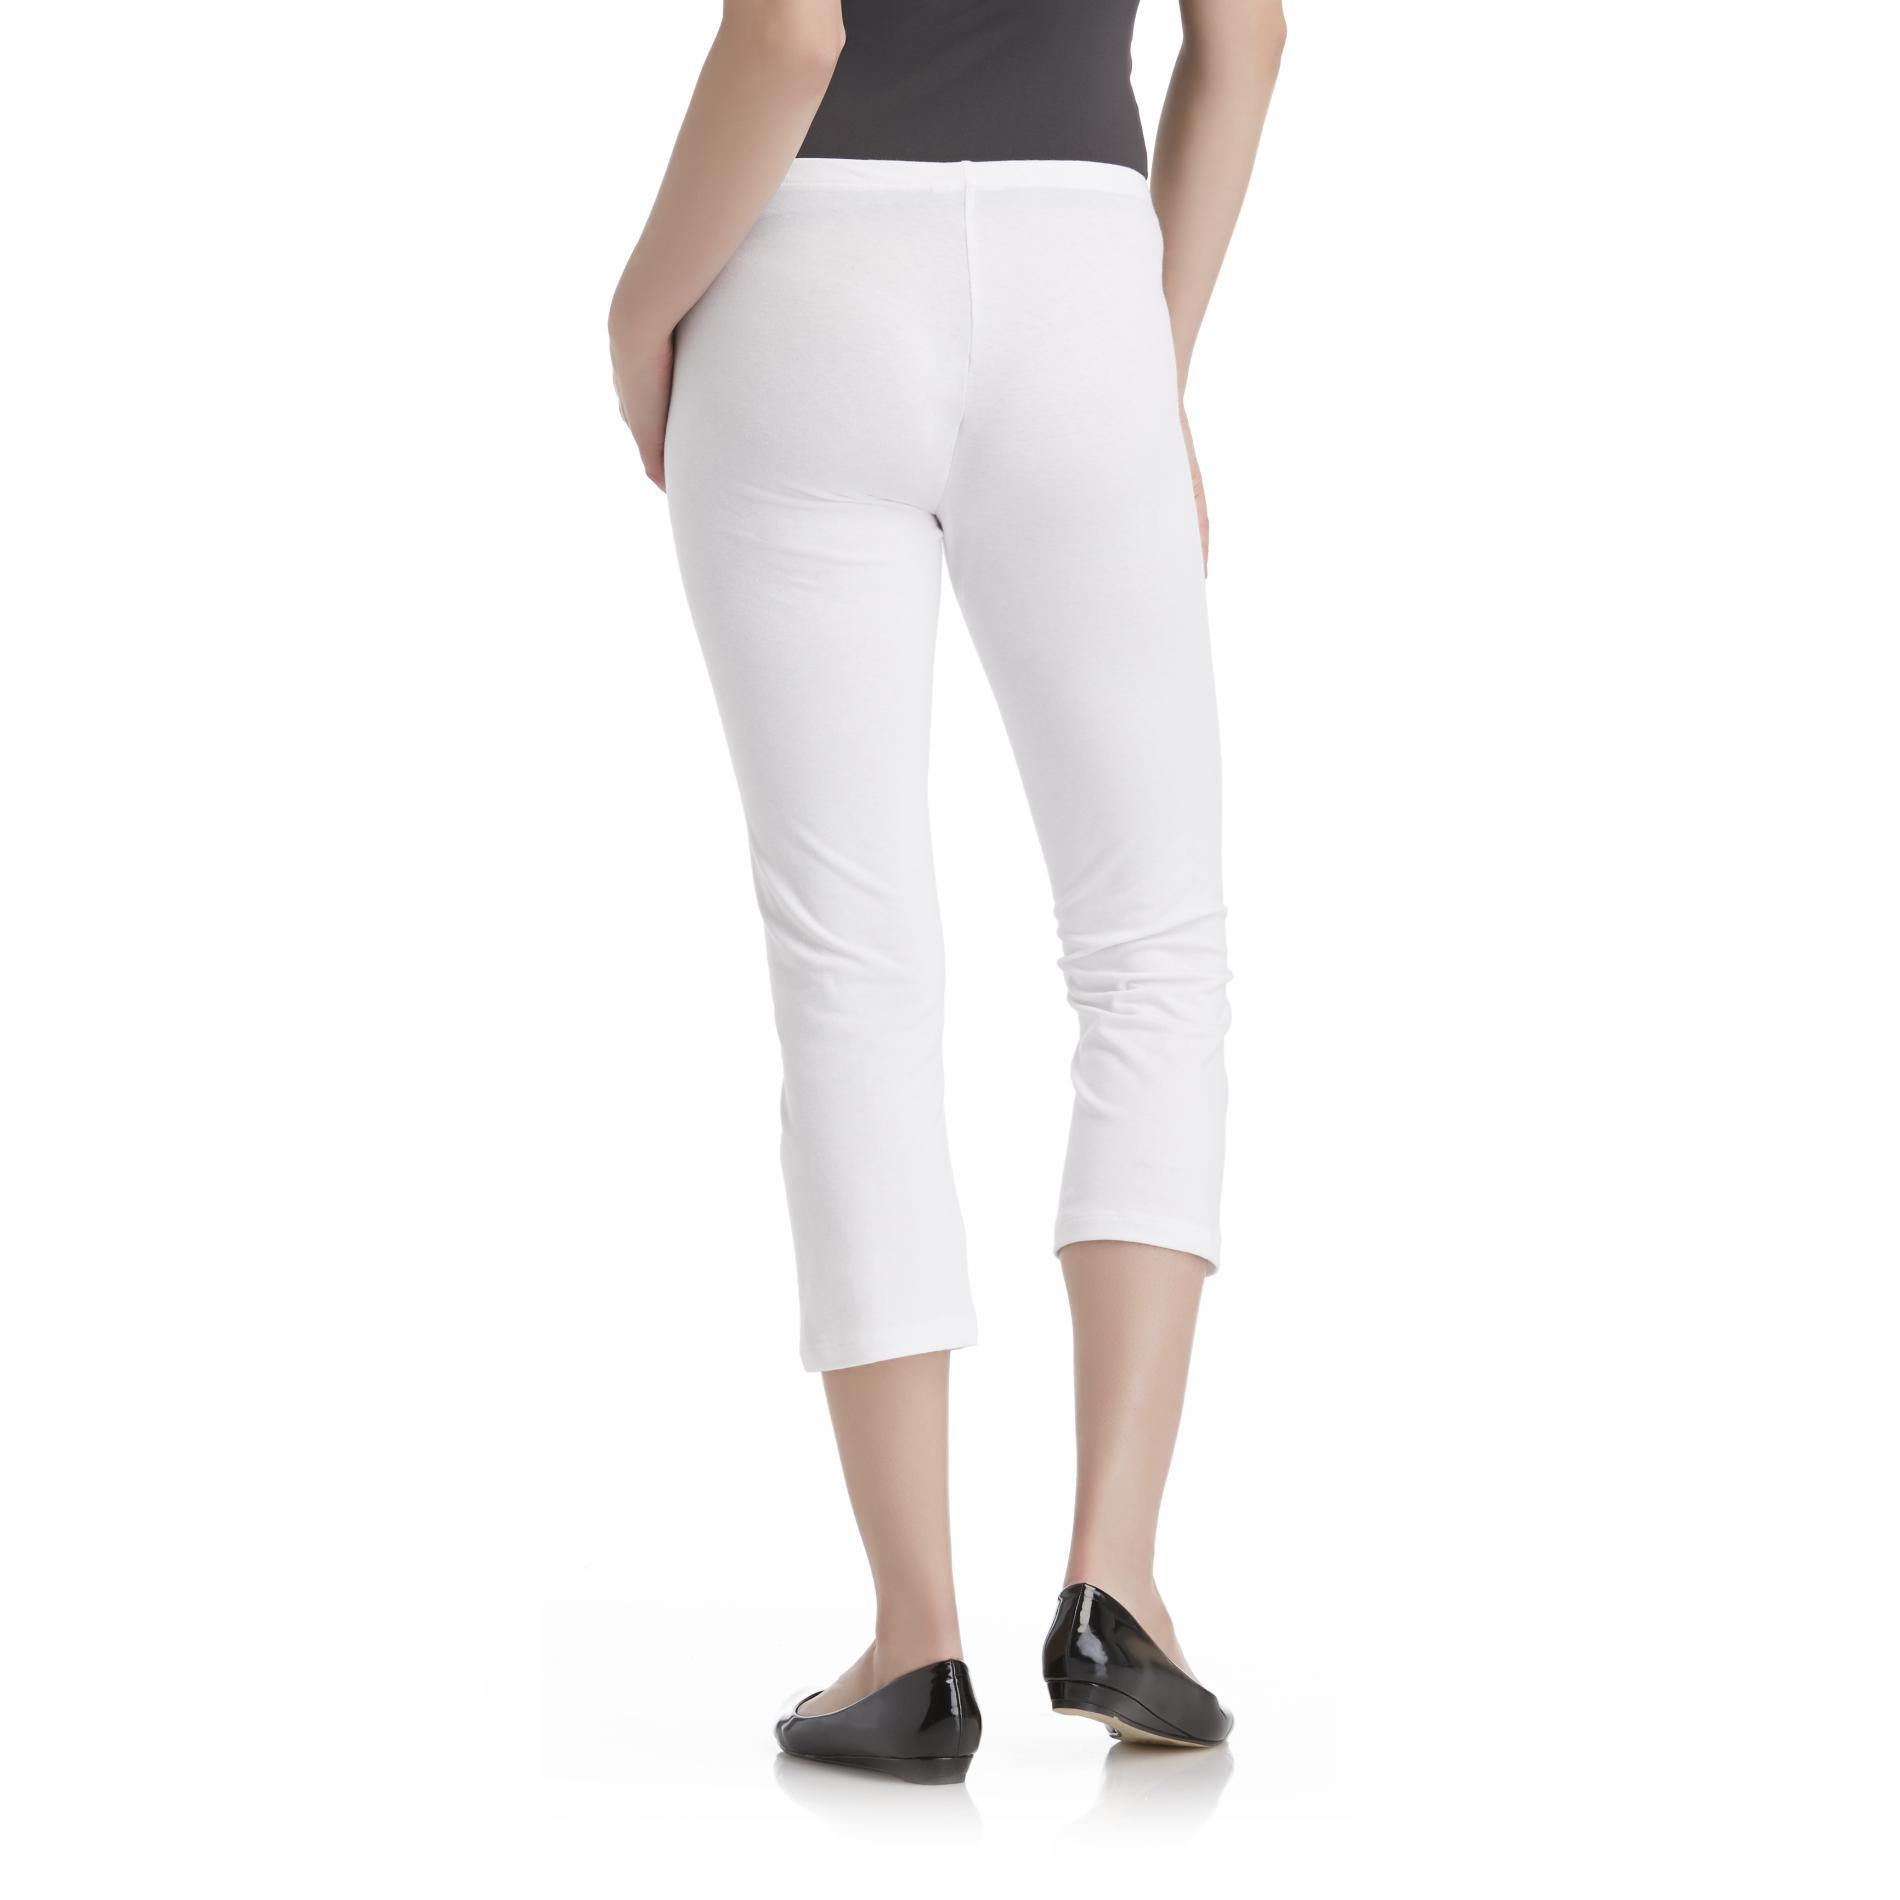 No Nonsense Women's Capri Leggings